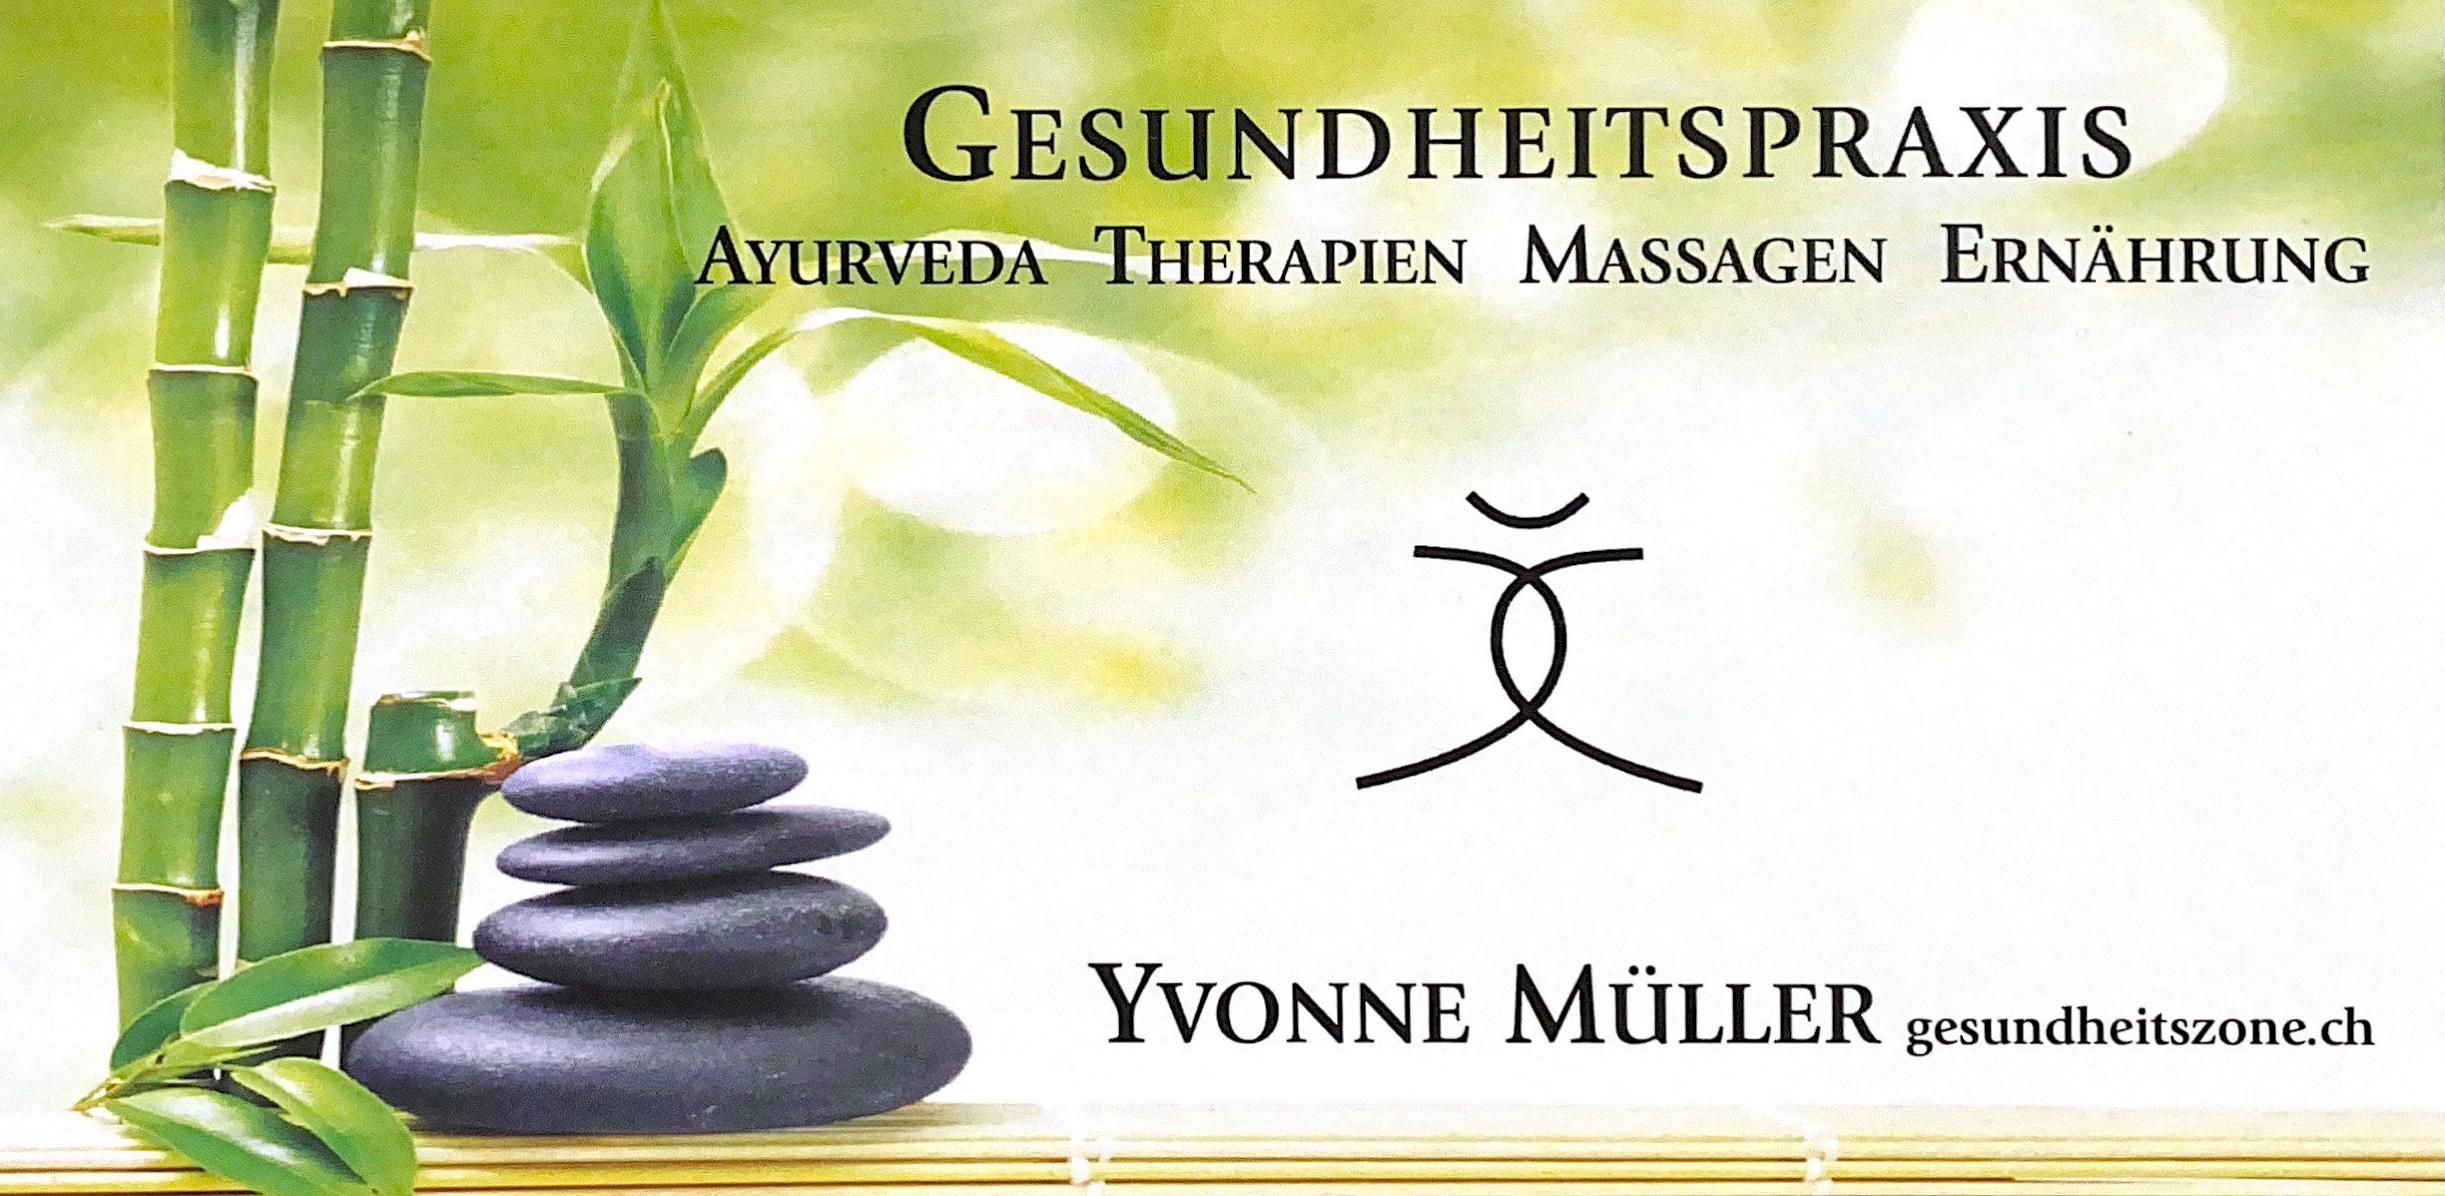 Gesundheits Praxis, Yvonne Müller